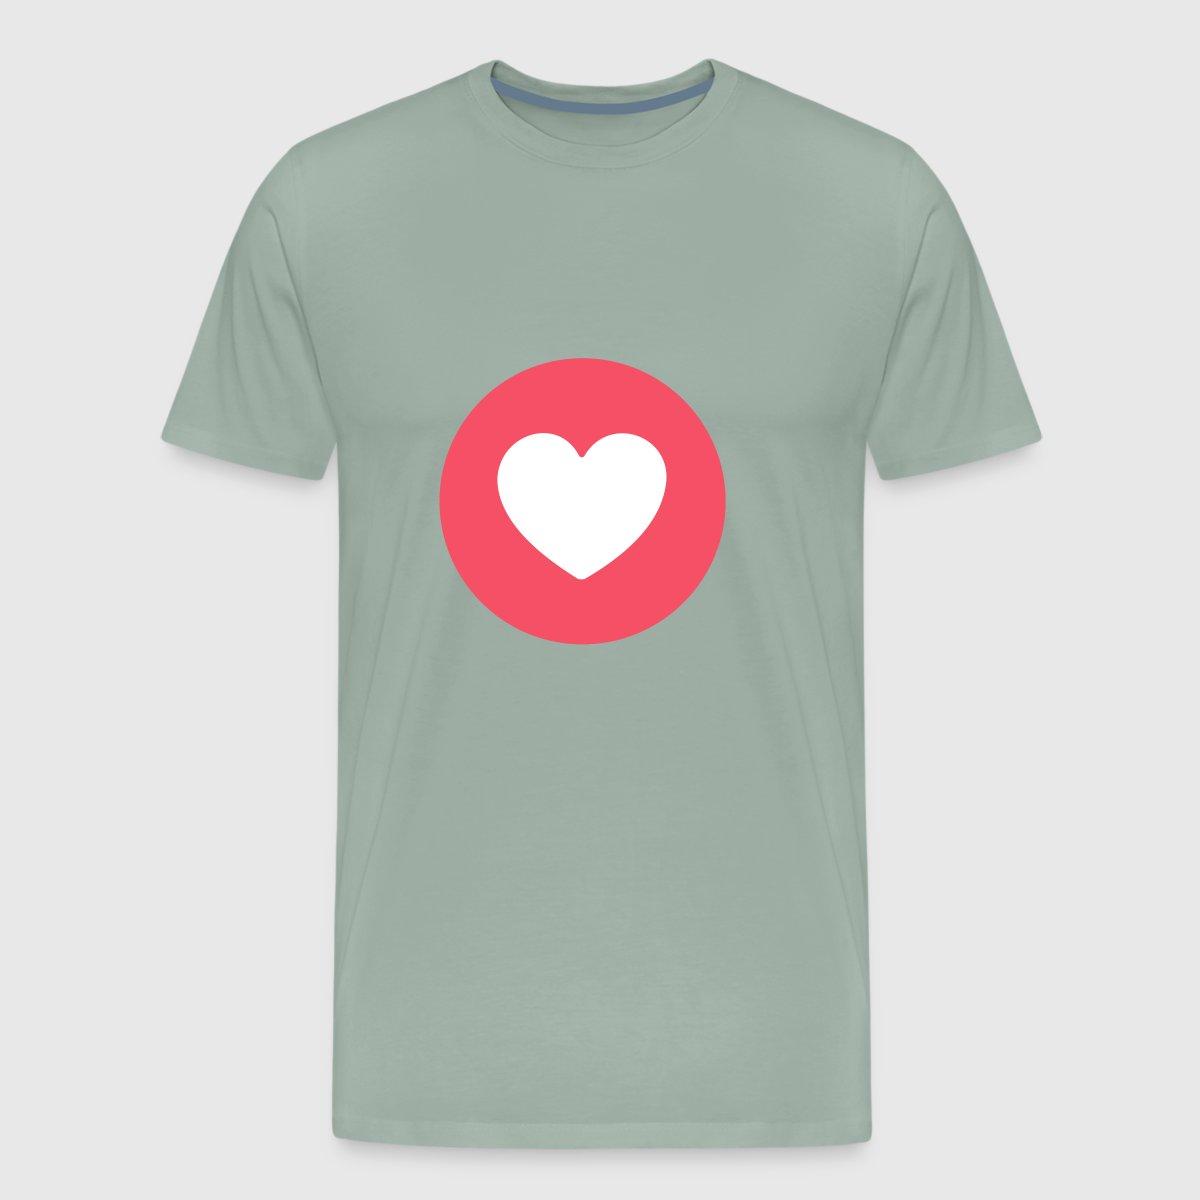 Tee Shirt Facebook Circle Heart Love By Spreadshirt